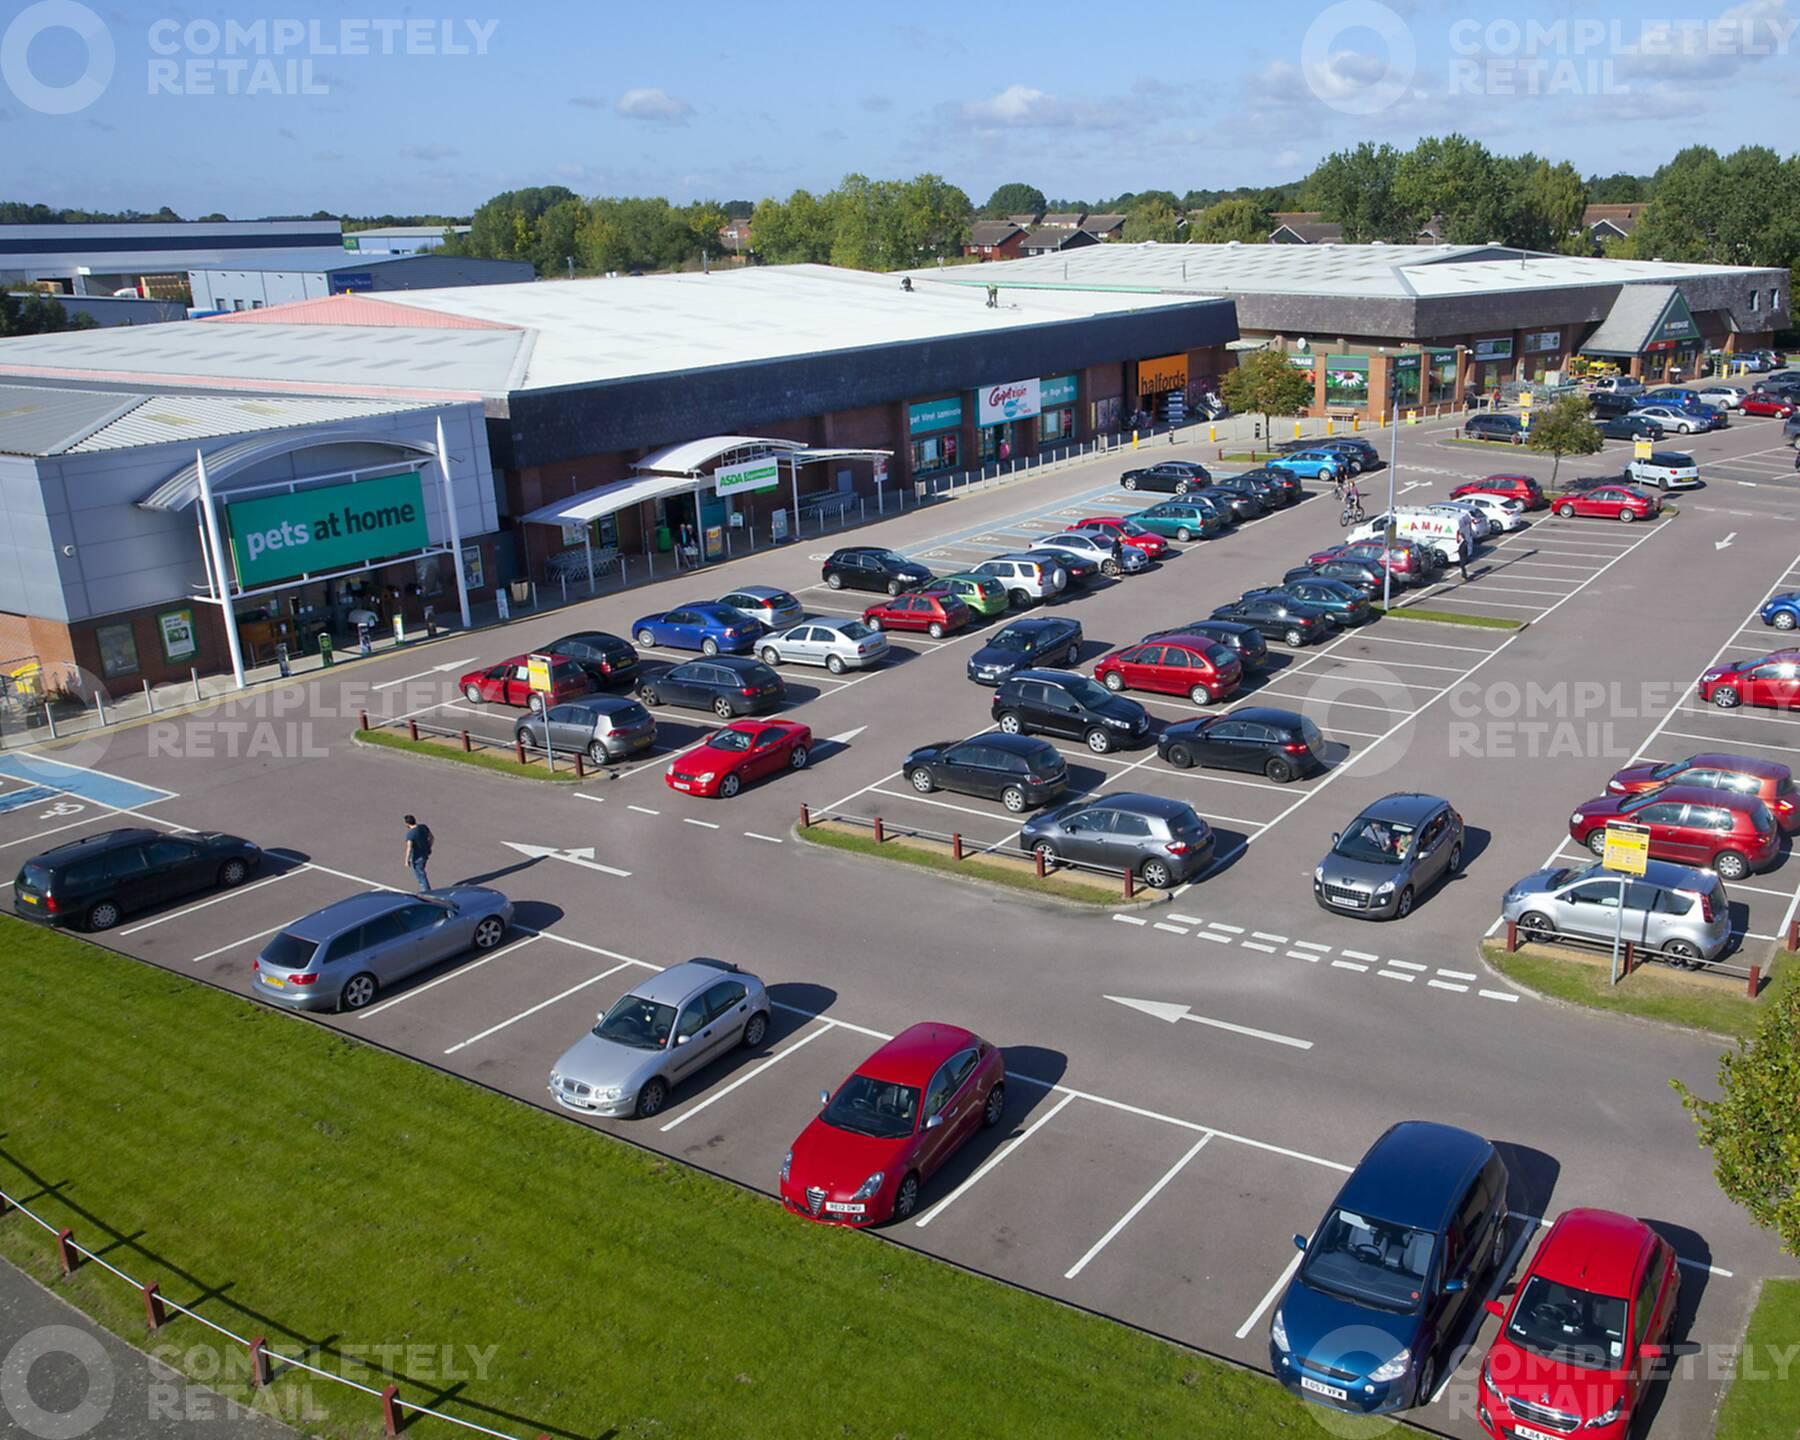 Studlands Shopping Park